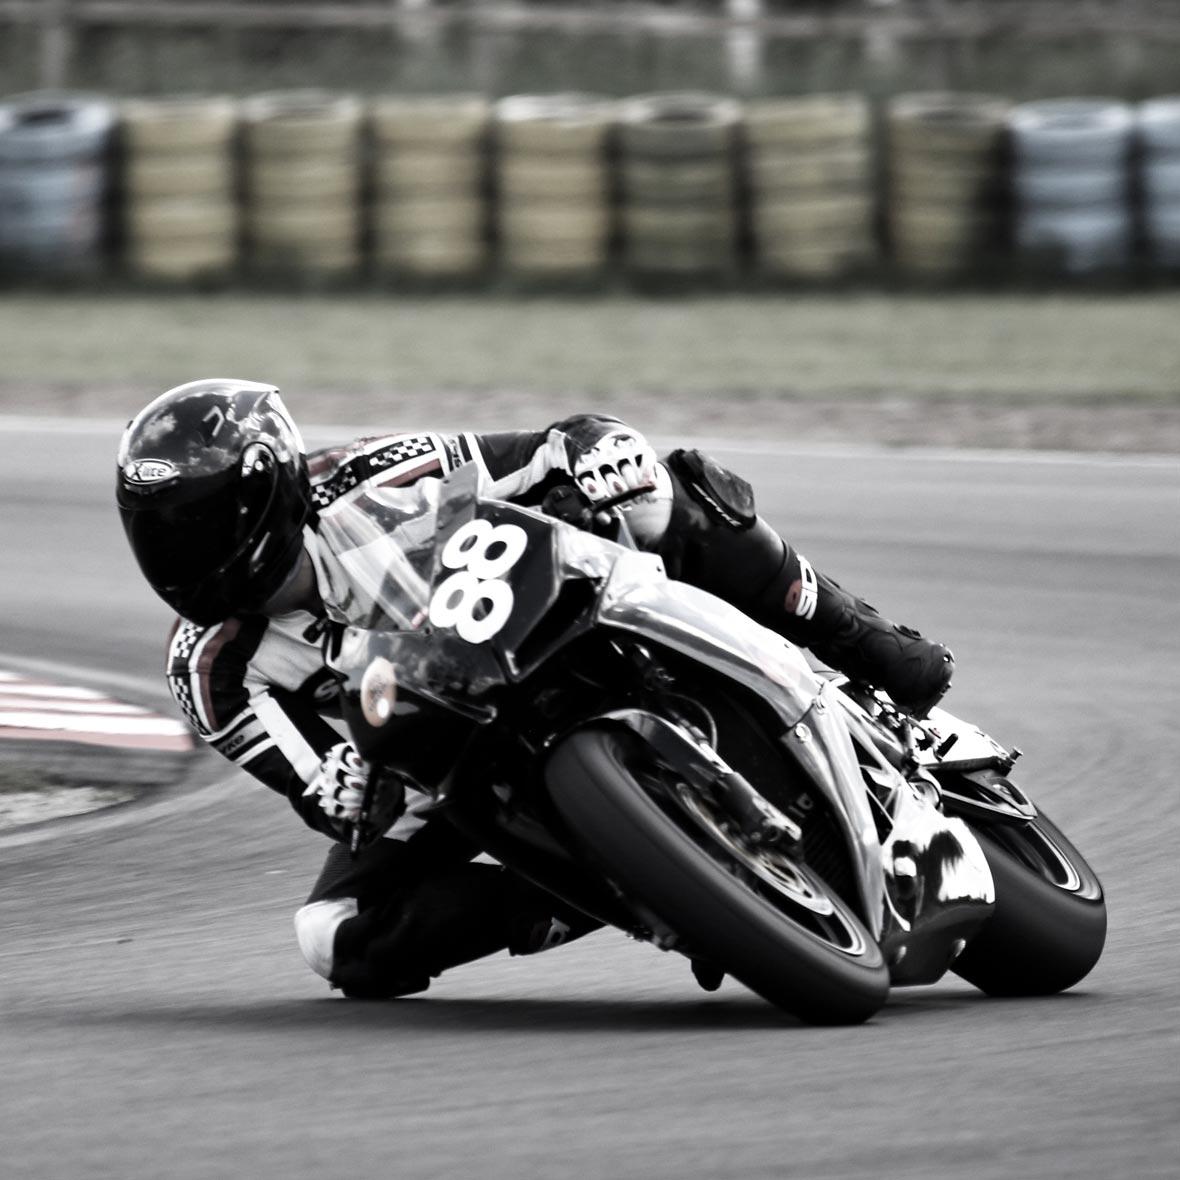 Aprilia RSV4 - Team mc4fun - Marlon Dixon